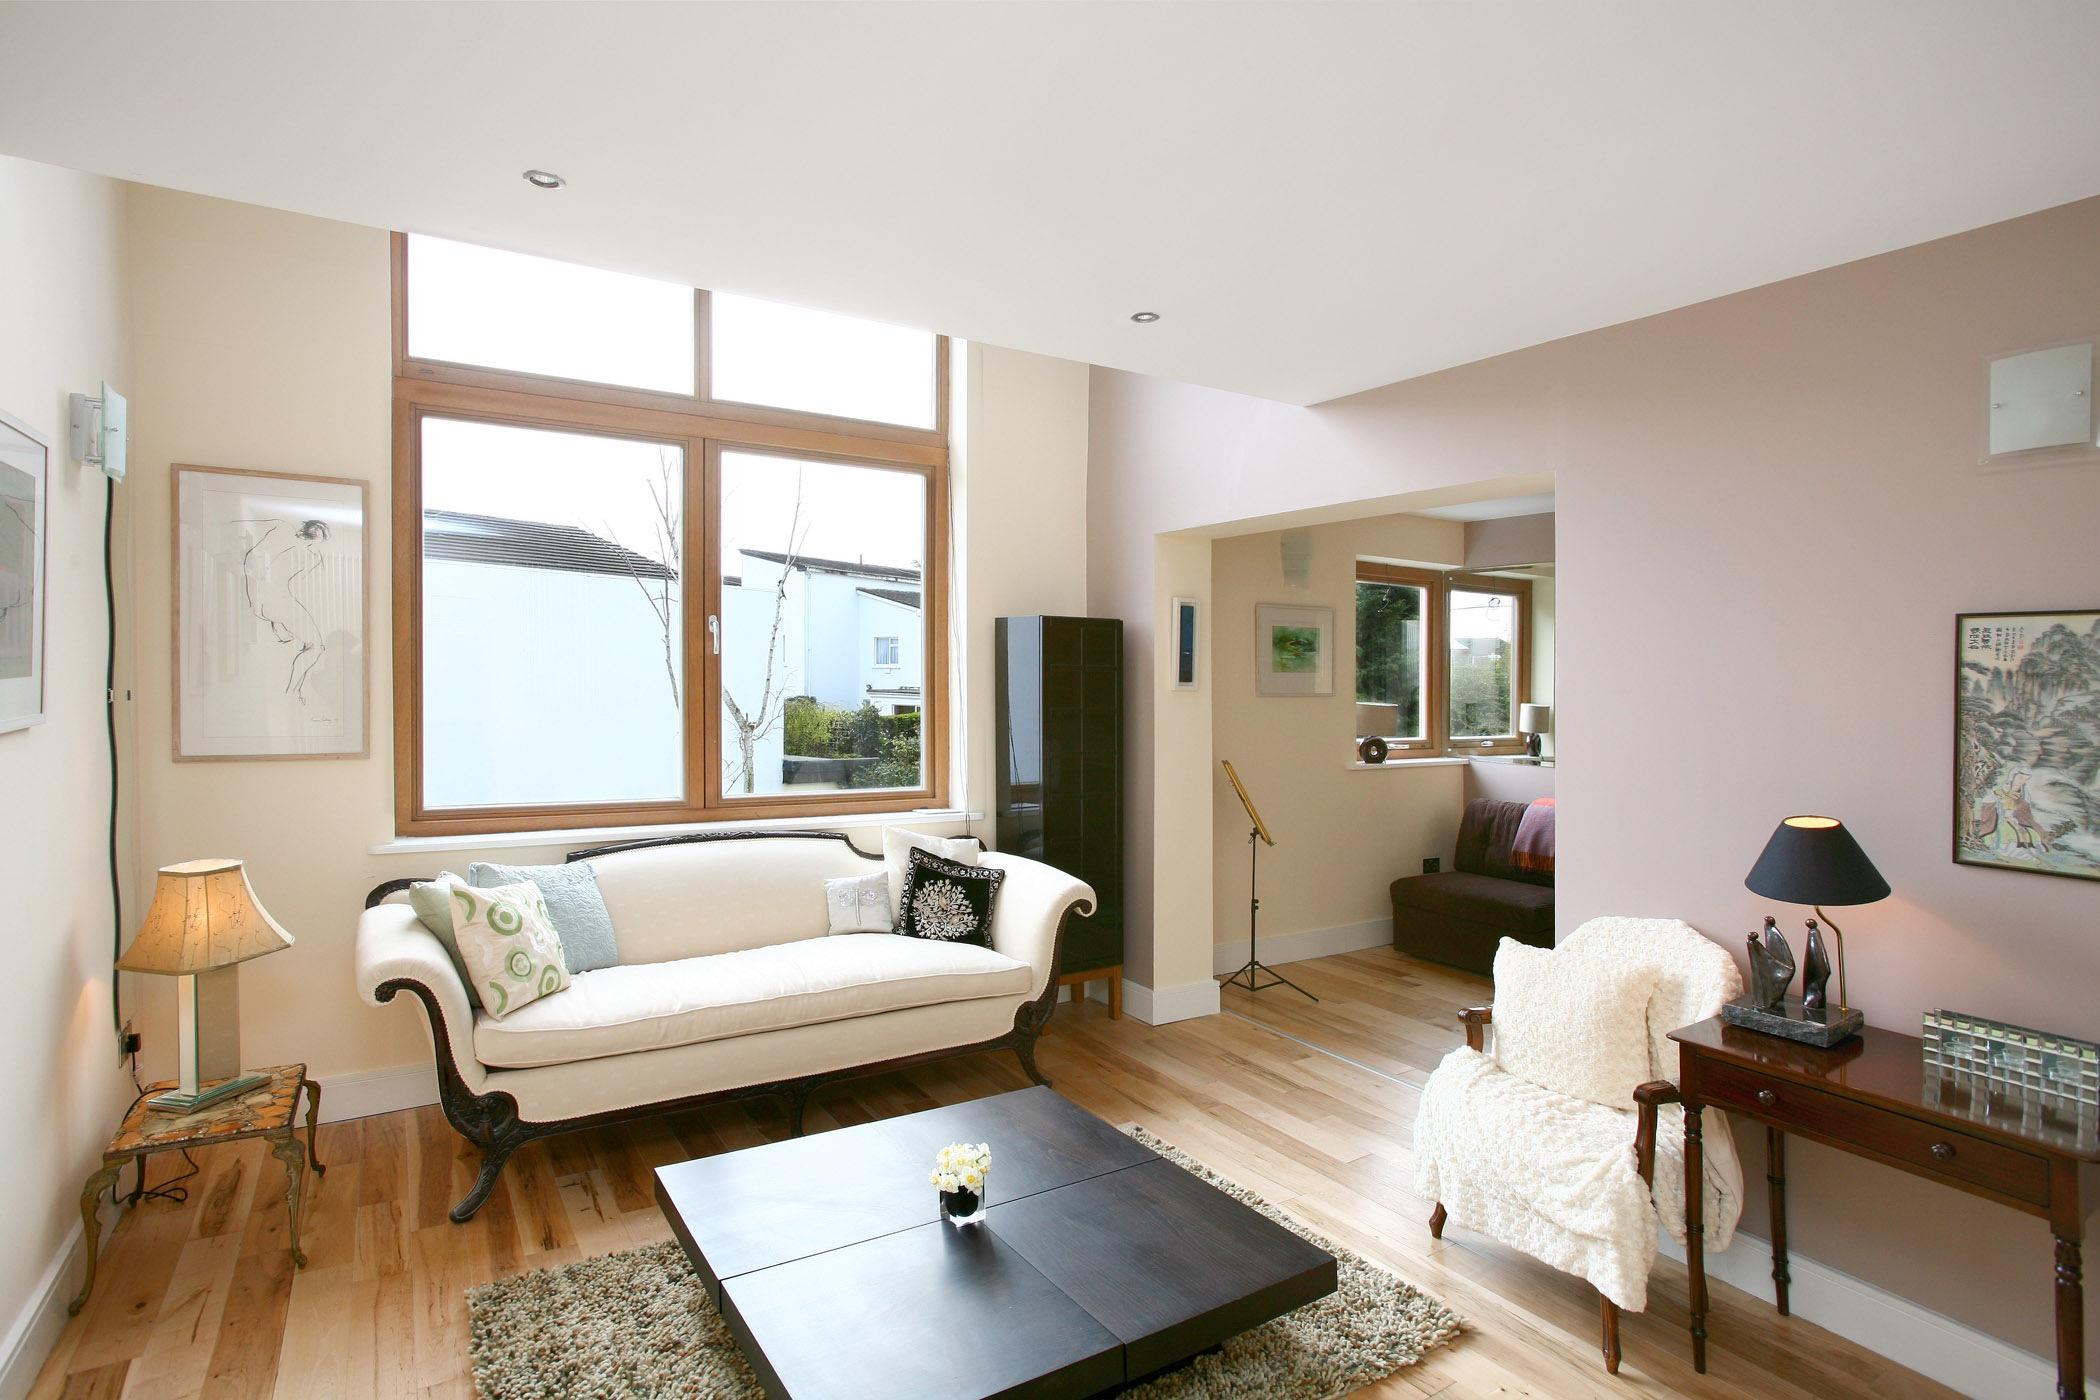 New_House_Architect_Space_Light.jpg